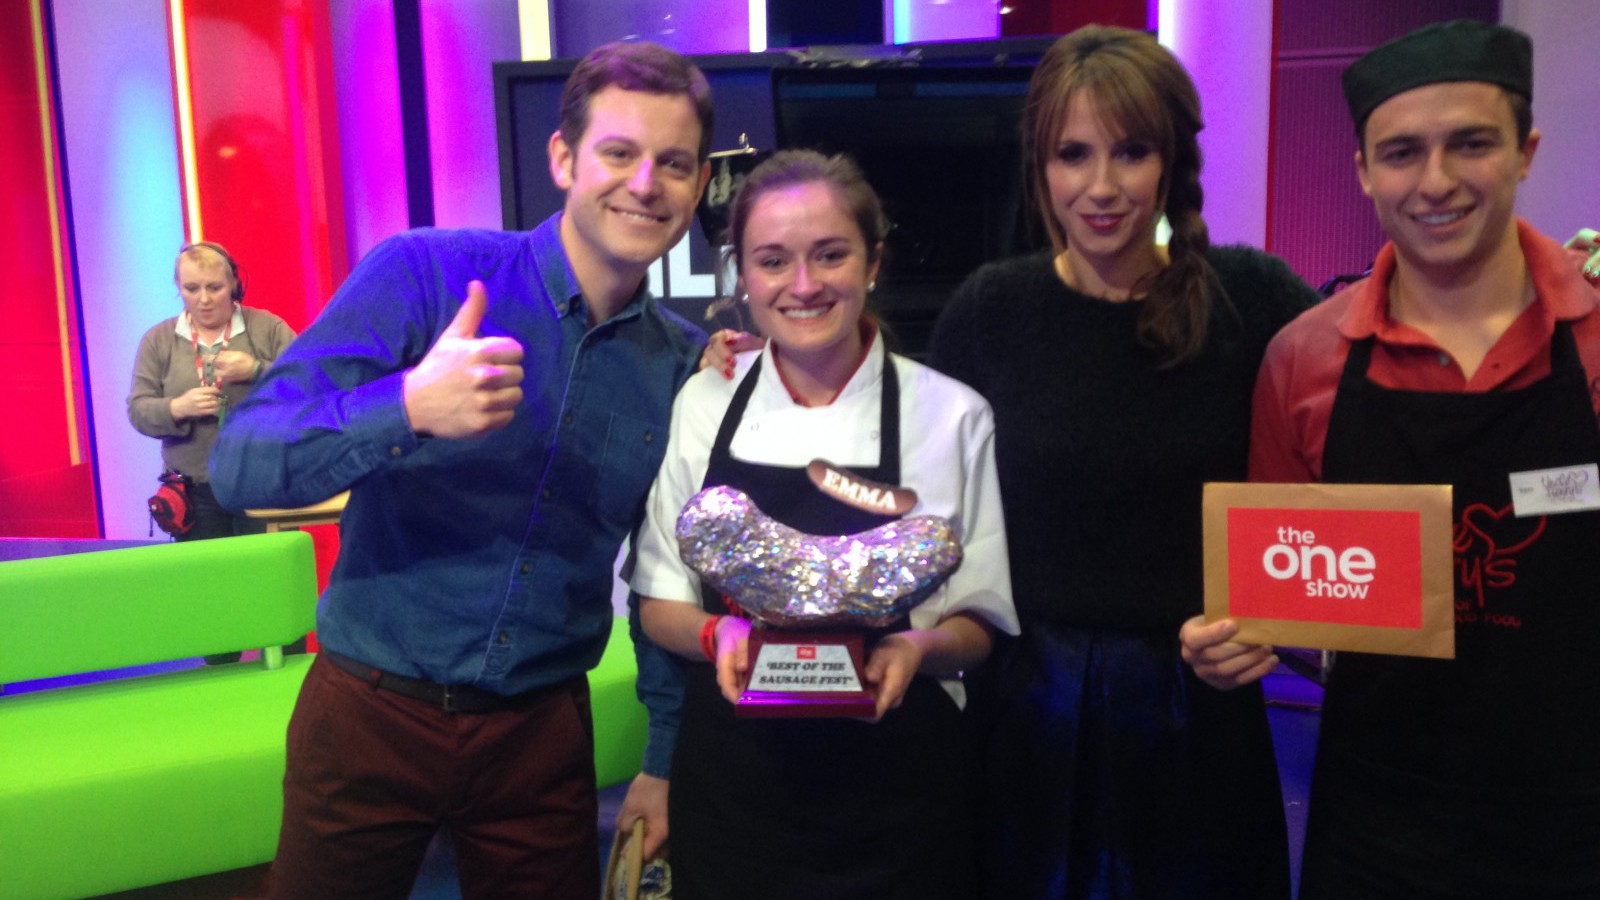 BBC One Show 2014